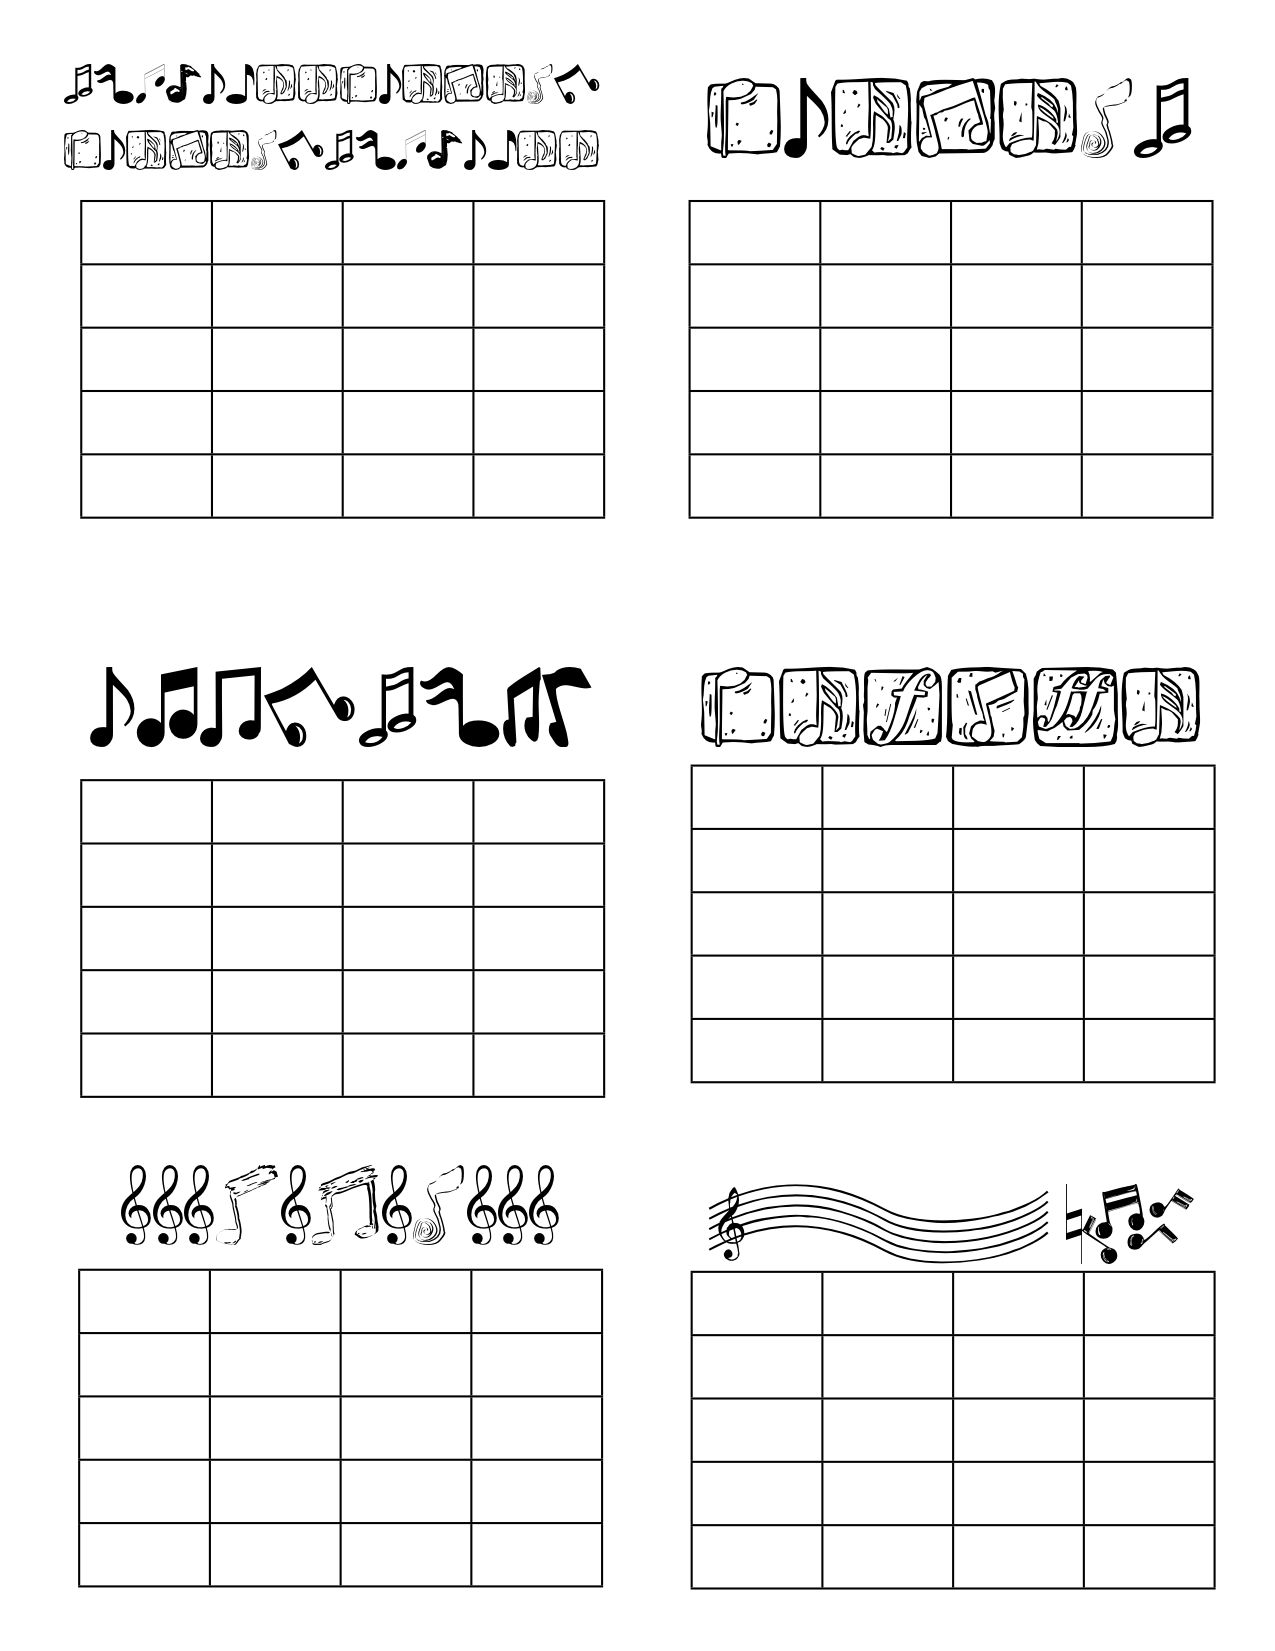 Fun Violin Practice Ideas Music Practice Charts Are